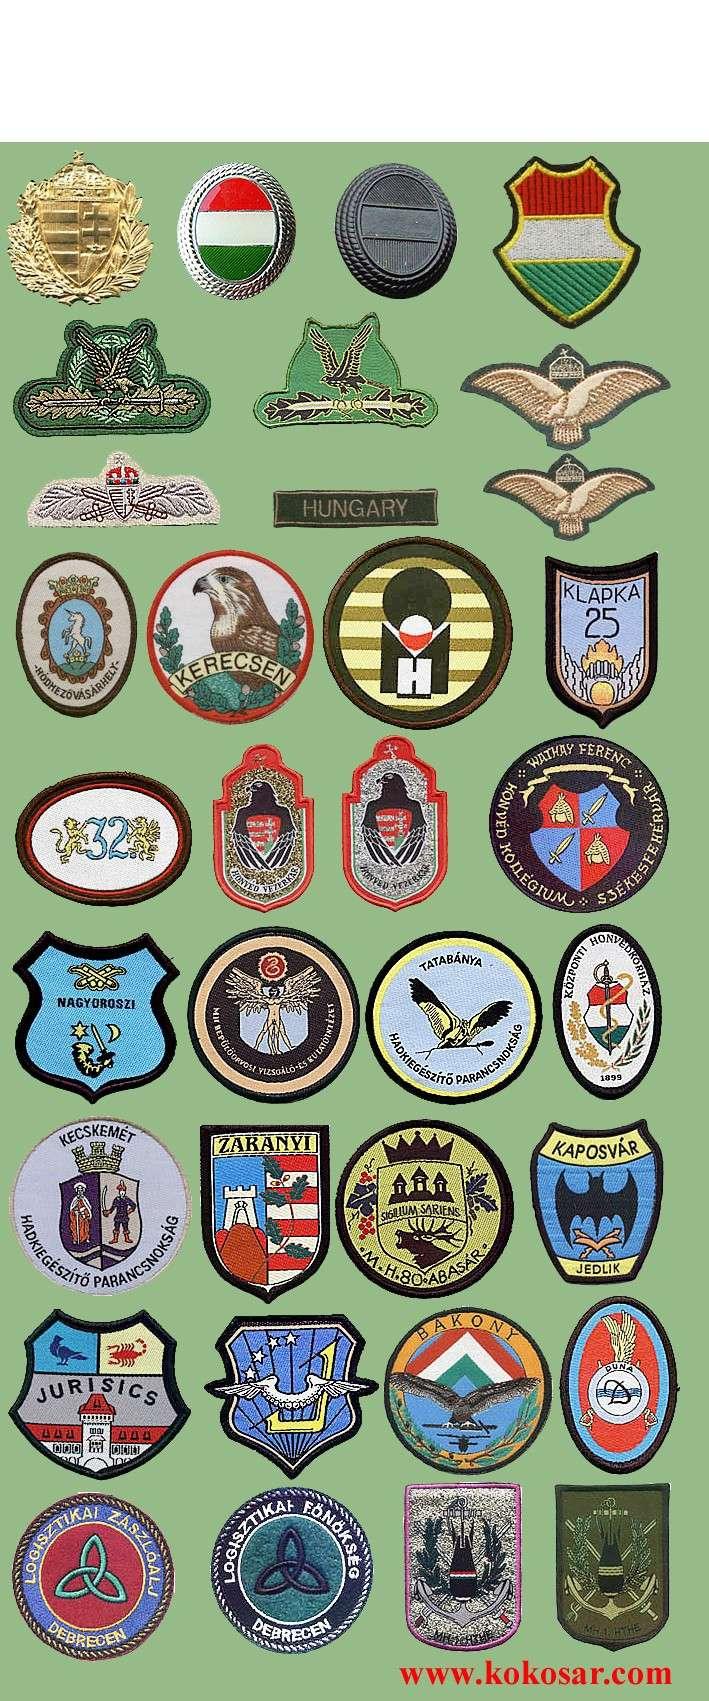 Hungarian military insignias Madars10